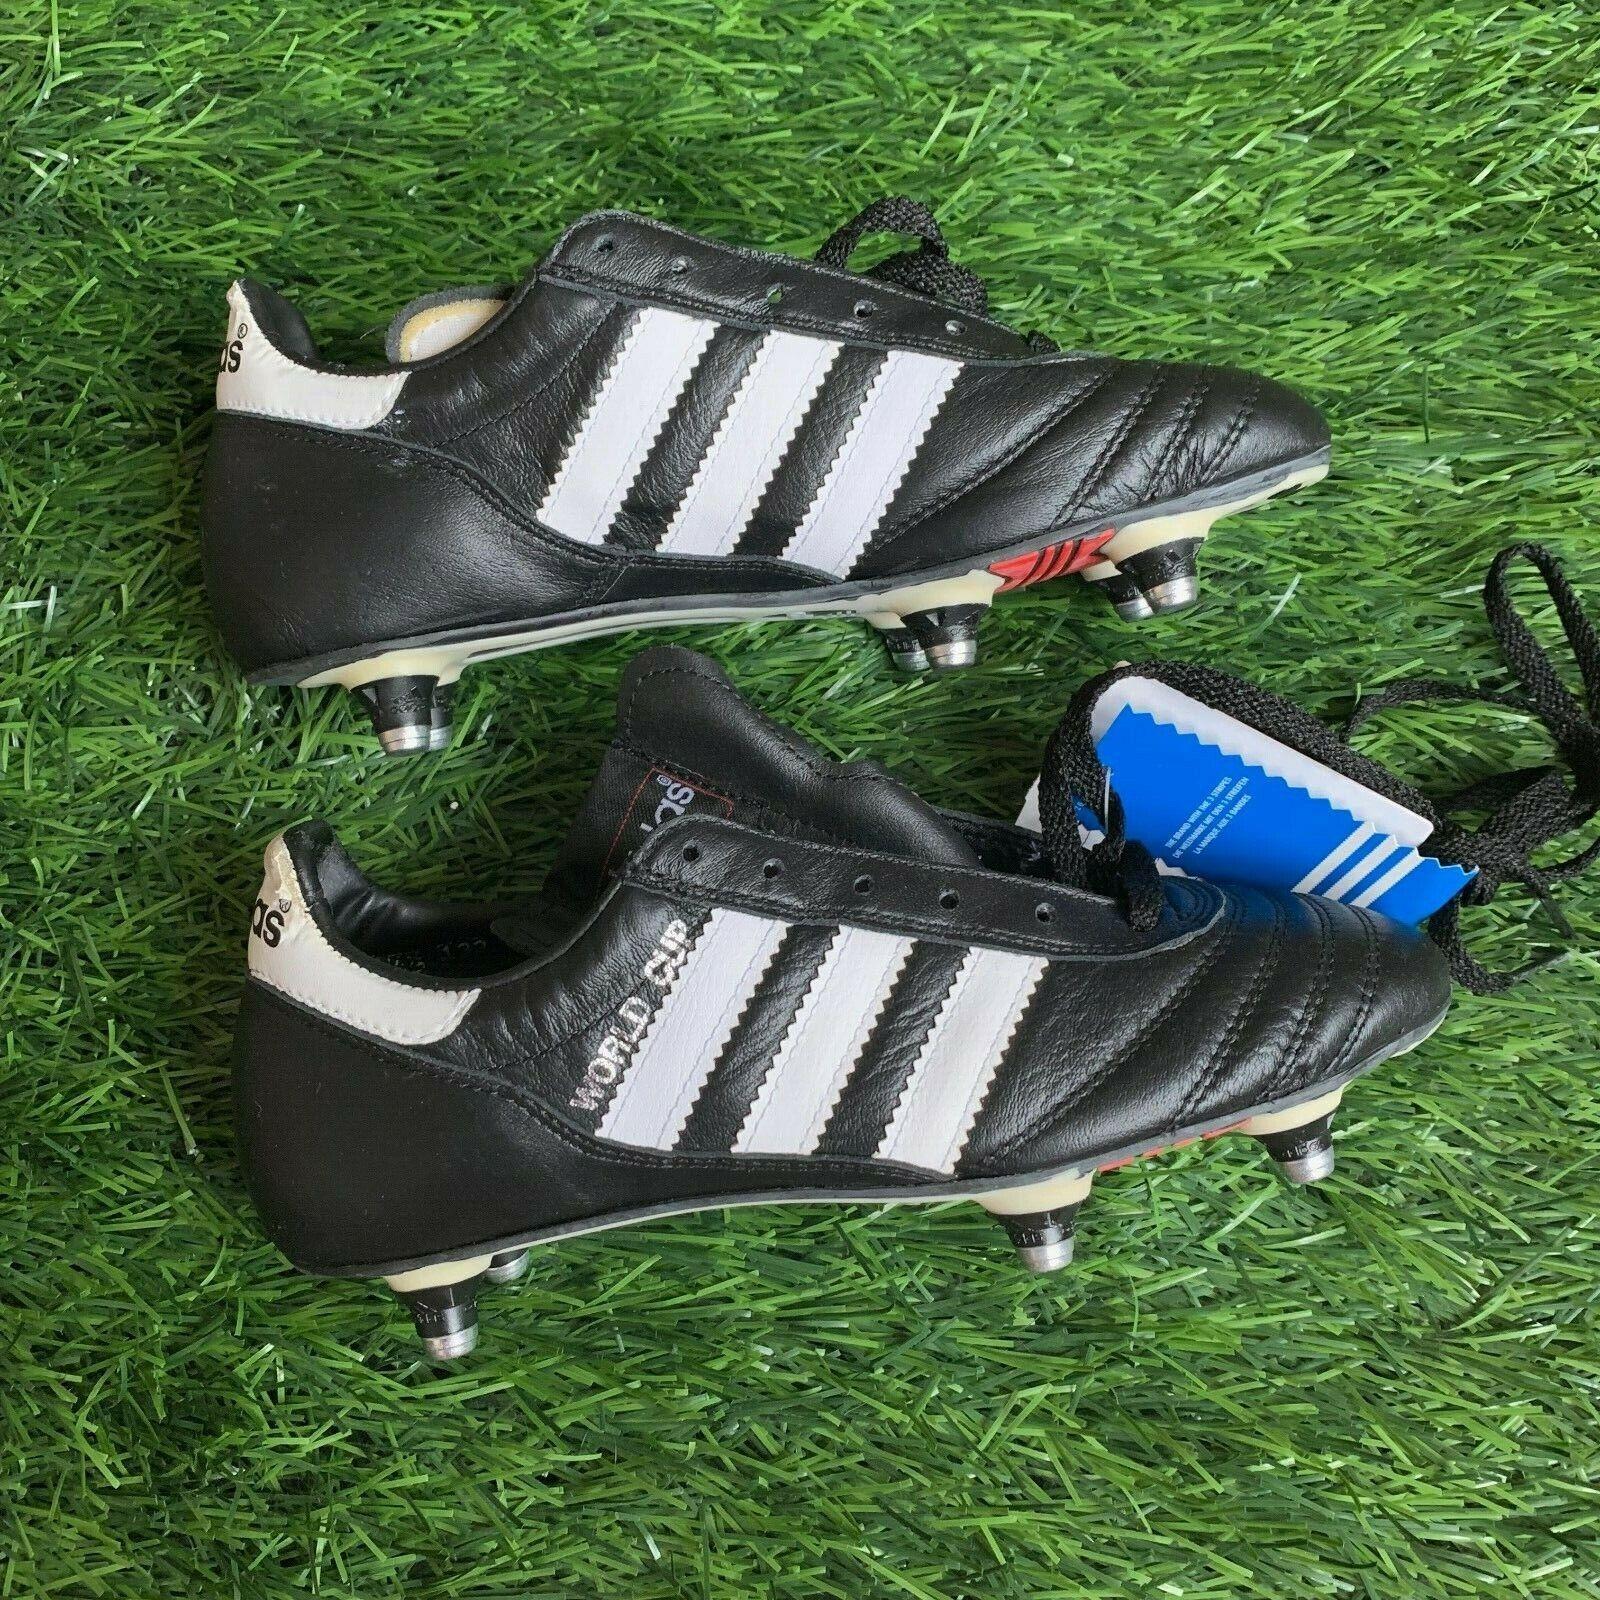 Adidas World Cup 011040 5US 4,5UK 2003 year nouveau RARE